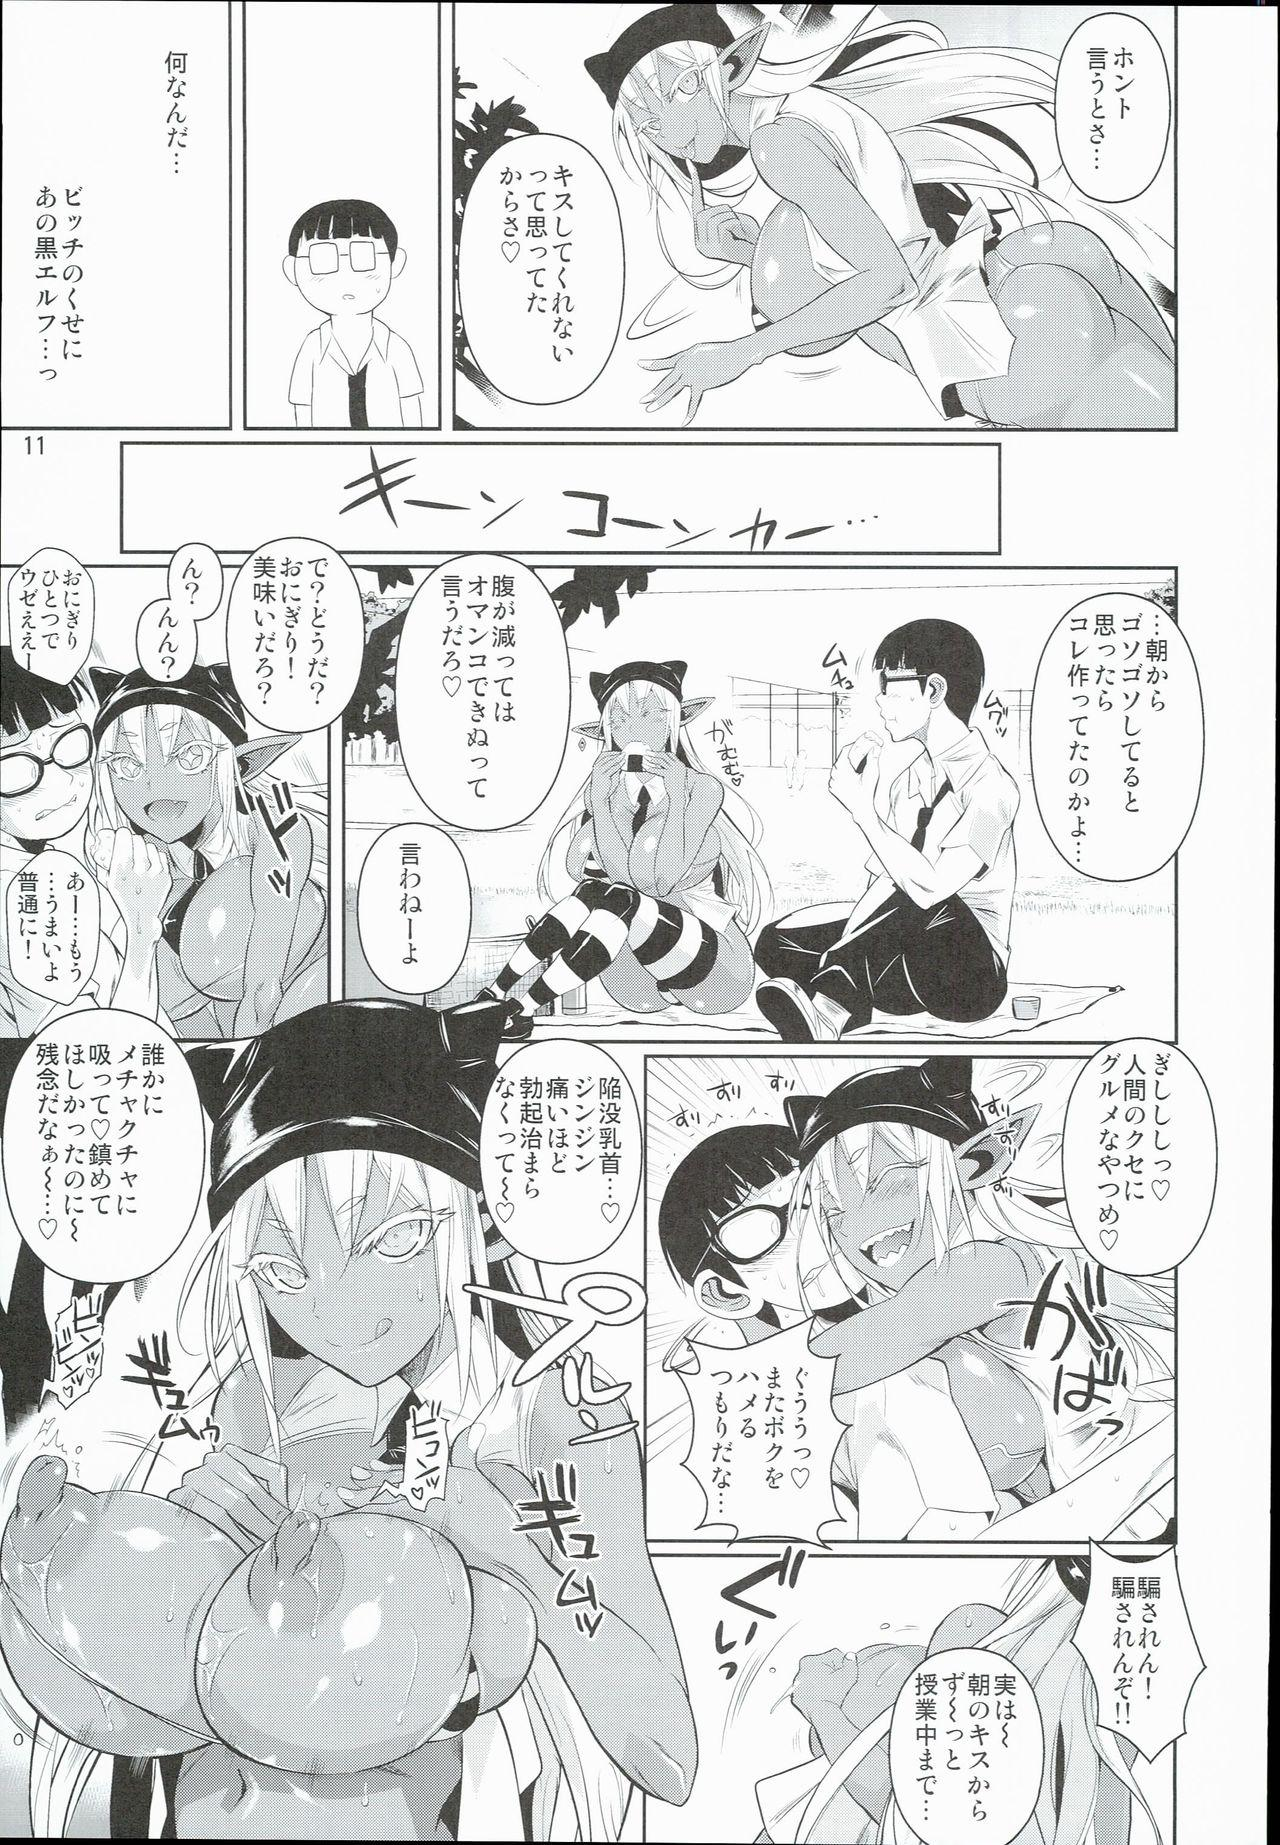 High Elf × High School Shuugeki Hen Toujitsu 12